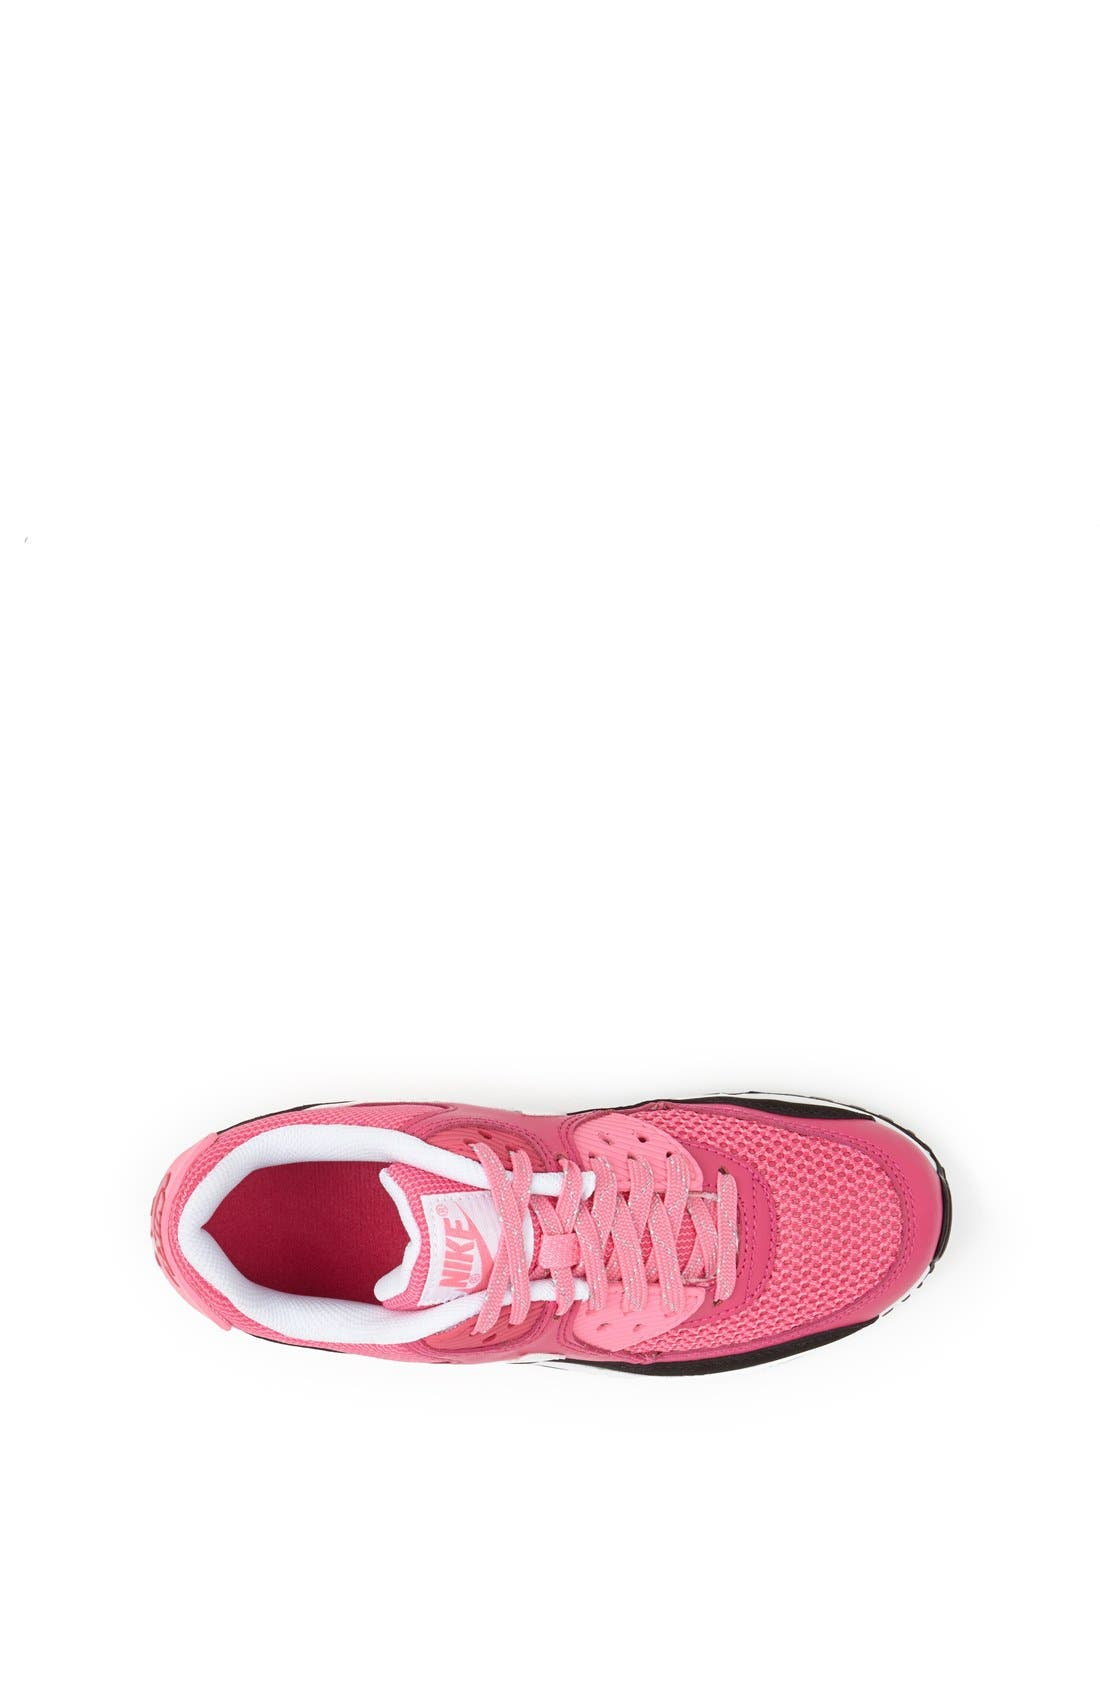 Alternate Image 3  - Nike 'Air Max 90 LE' Running Shoe (Big Kid)